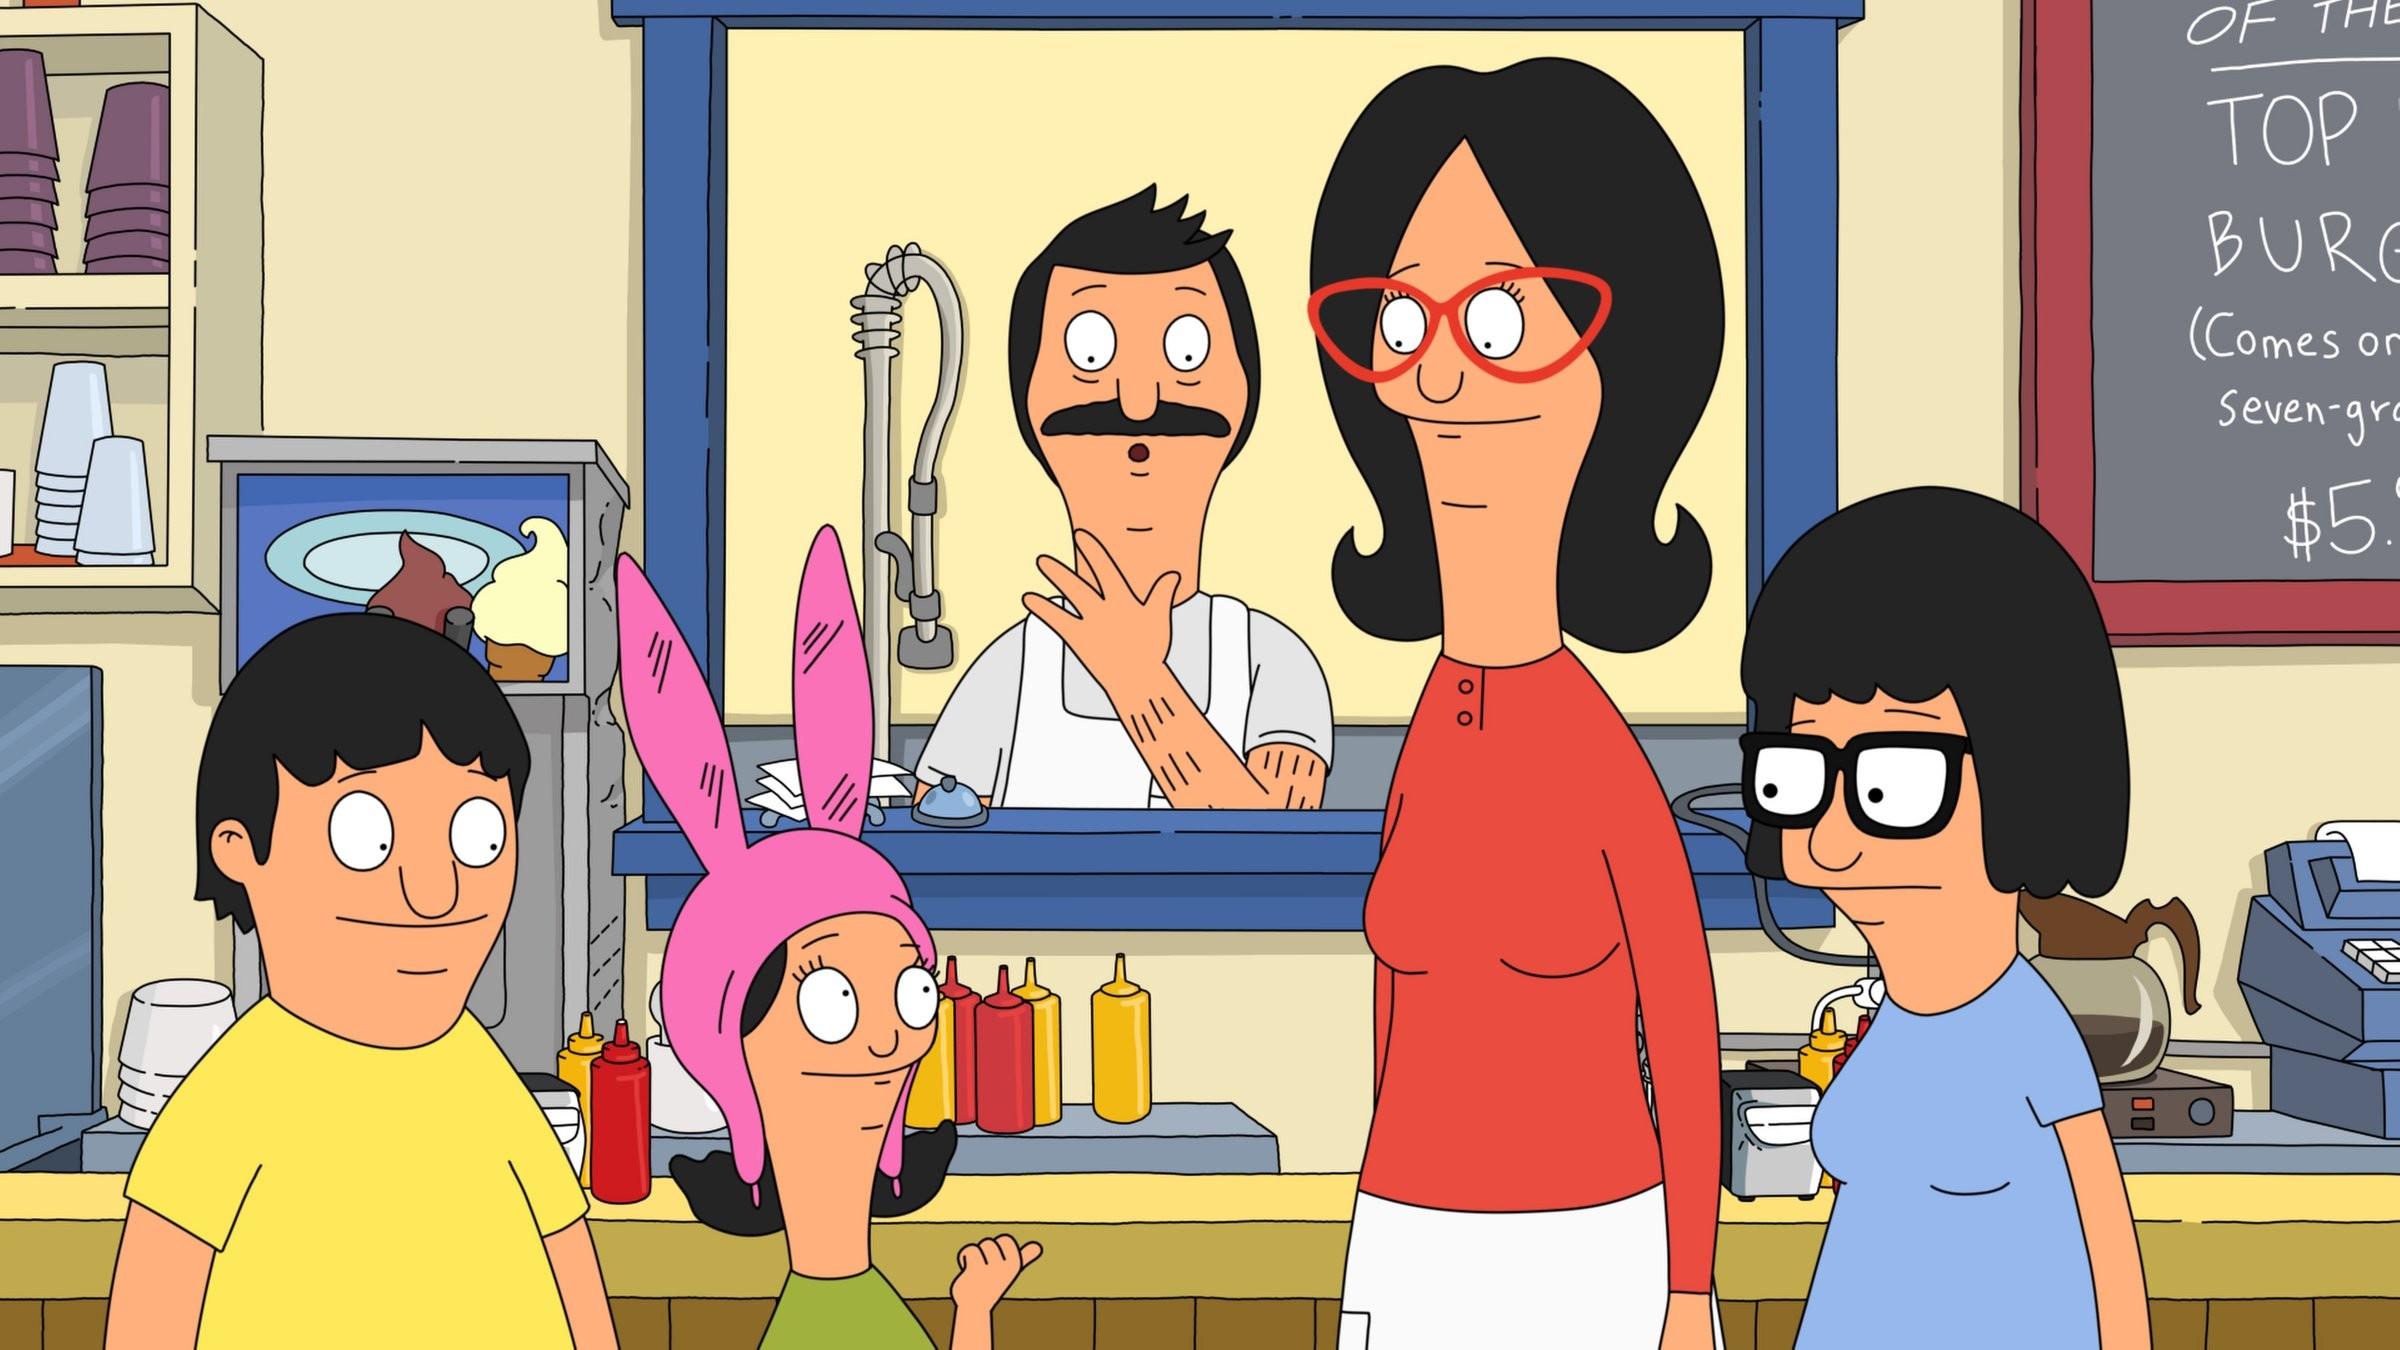 BOBS BURGERS animation comedy cartoon fox series family (11) wallpaper      353255   WallpaperUP